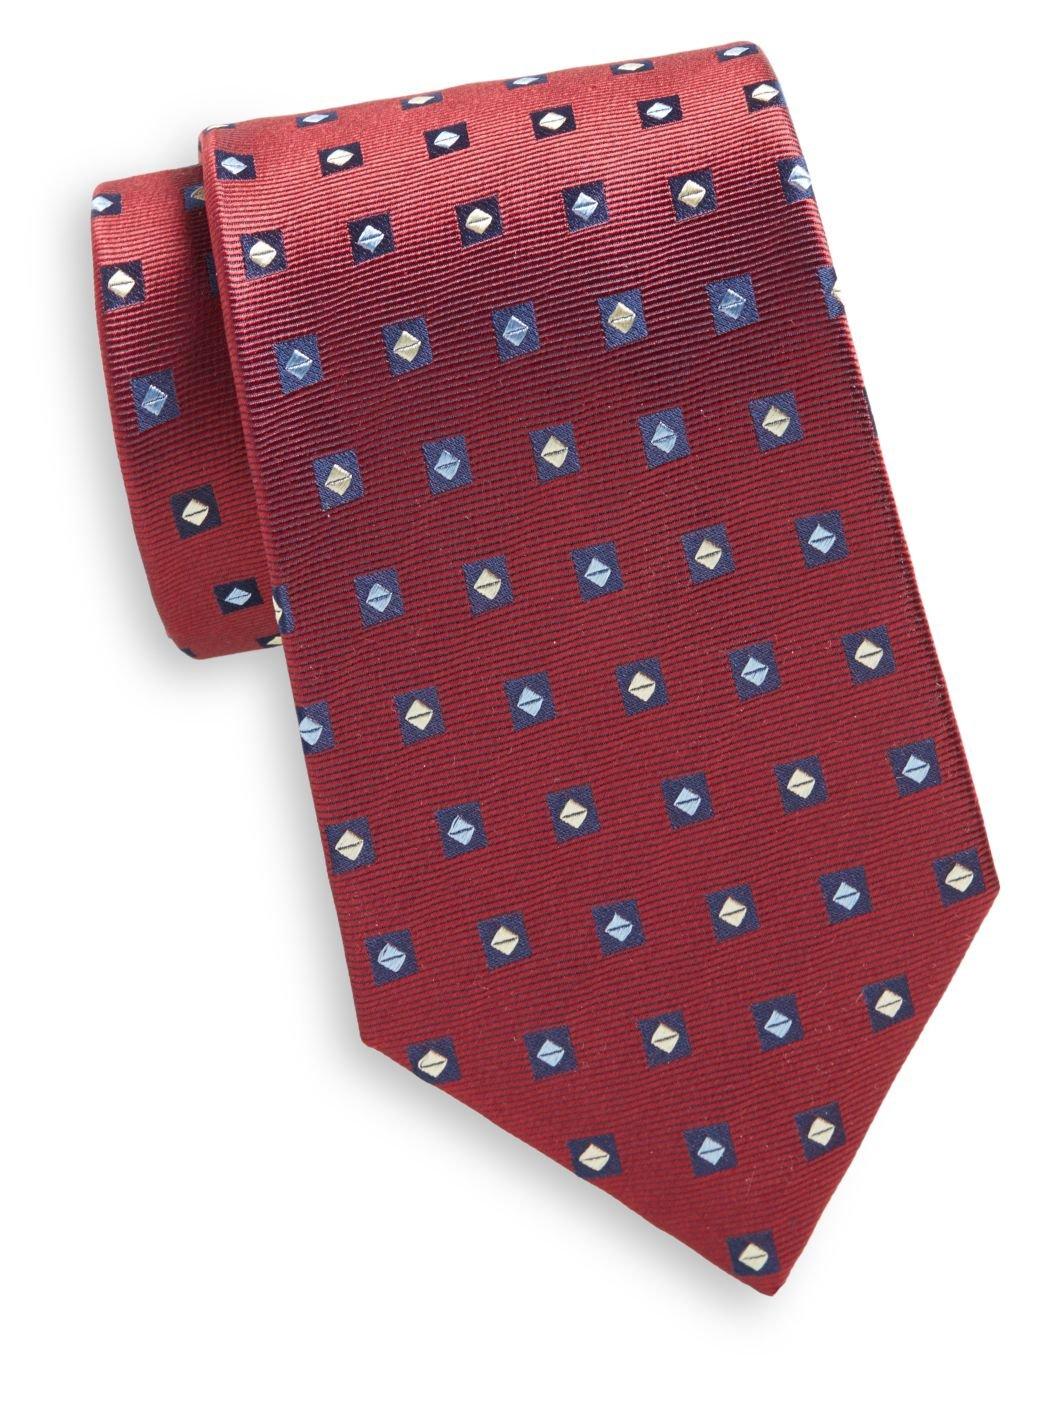 Yves Saint Laurent Men's Diamond Print Silk Tie, OS, Red